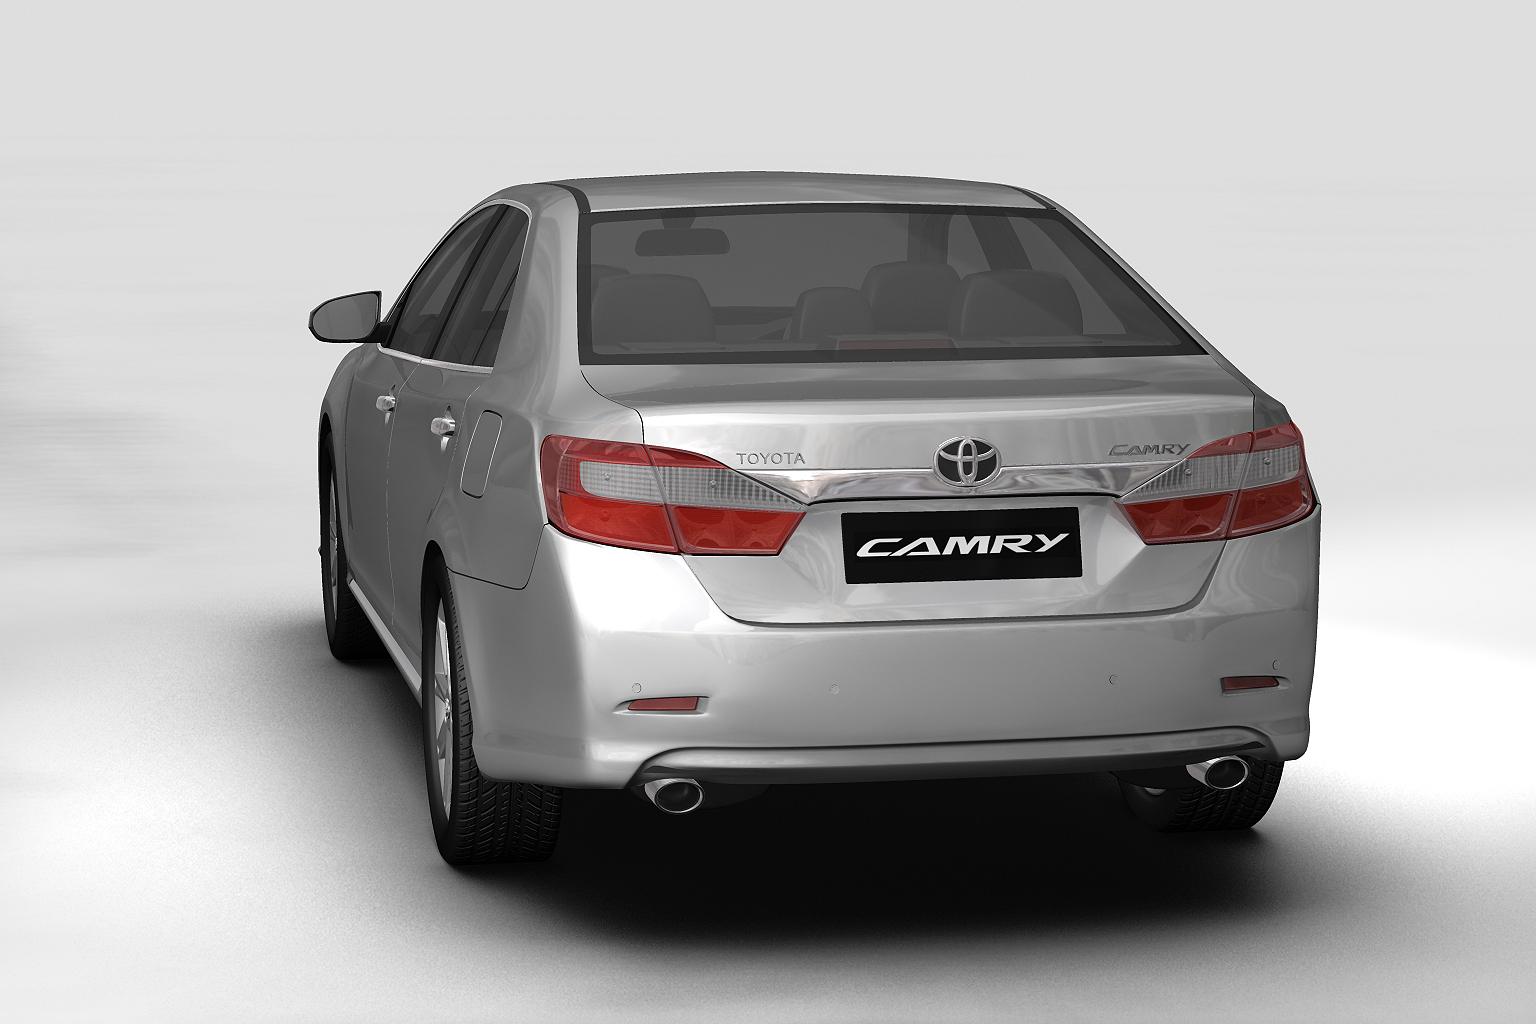 2012 toyota camry (asian) 3d model 3ds max fbx c4d lwo hrc xsi obj 136200